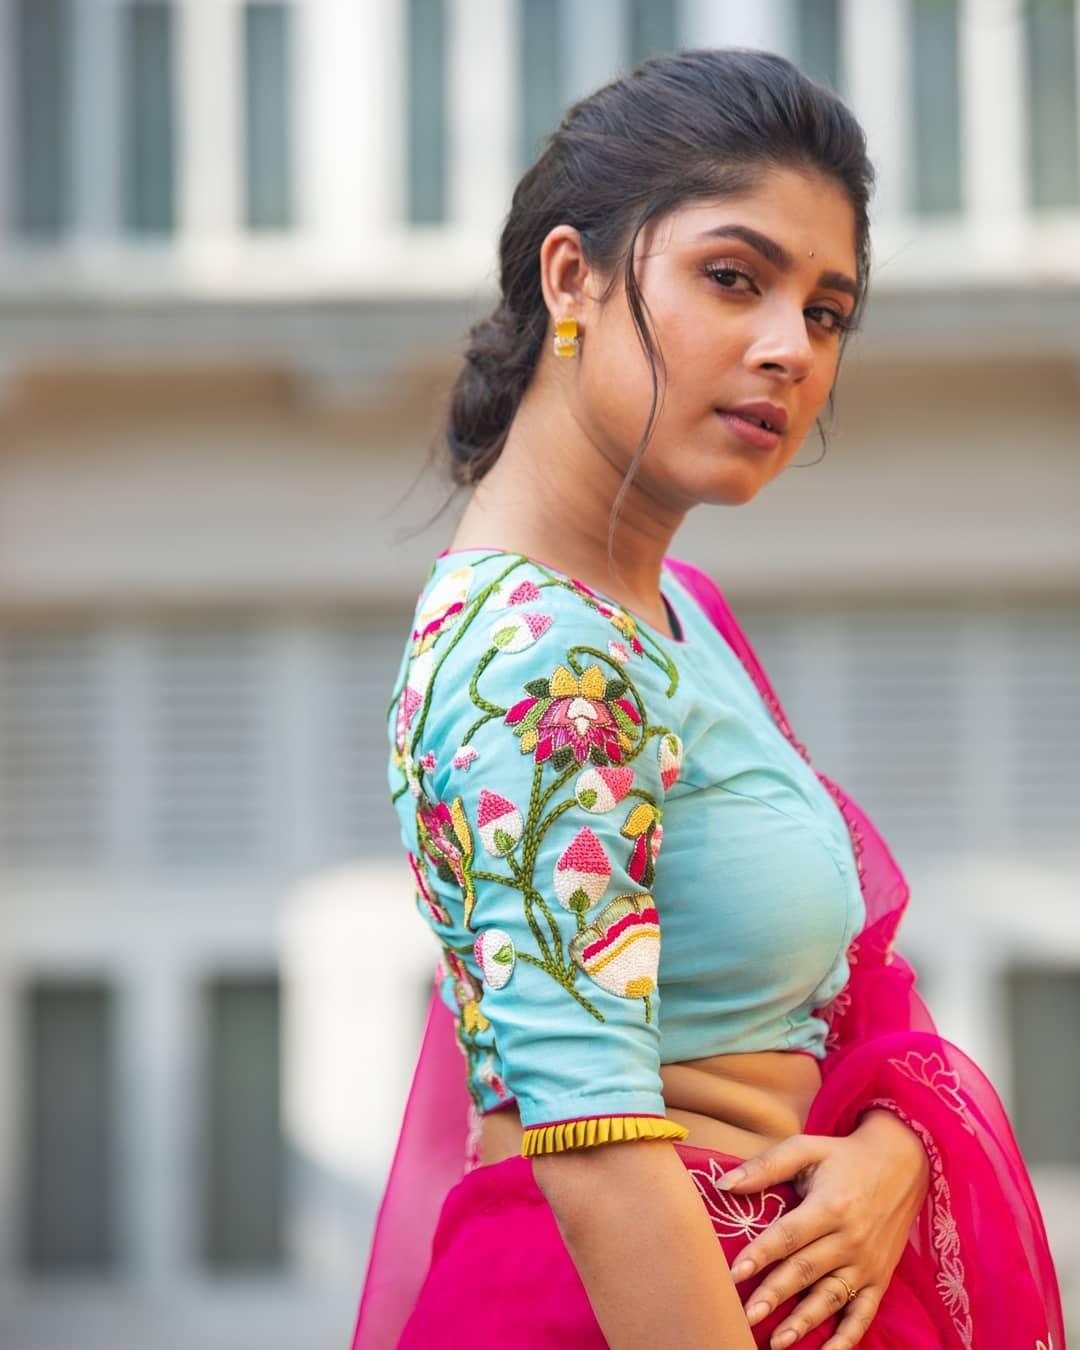 Lotus embroidered blouse-sayanti ghosh1